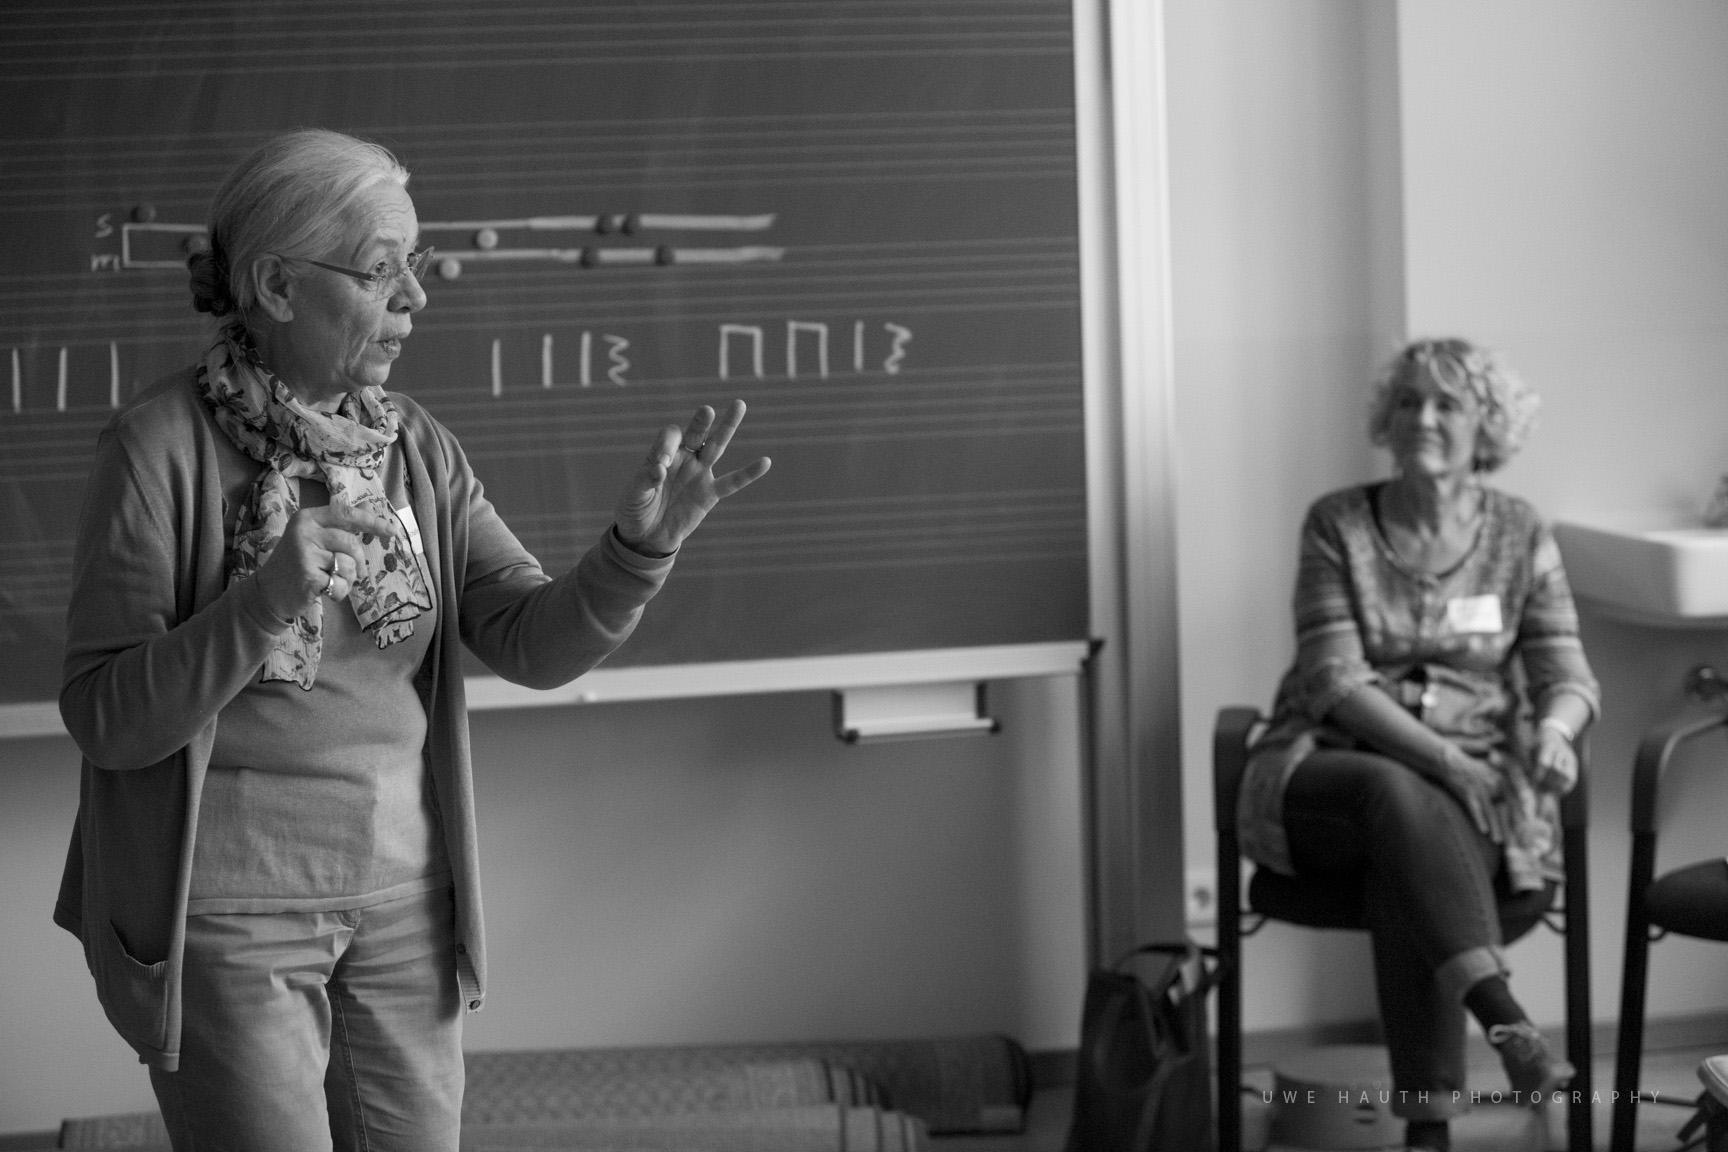 Fortbildung in Elementarer Musikpädagogik